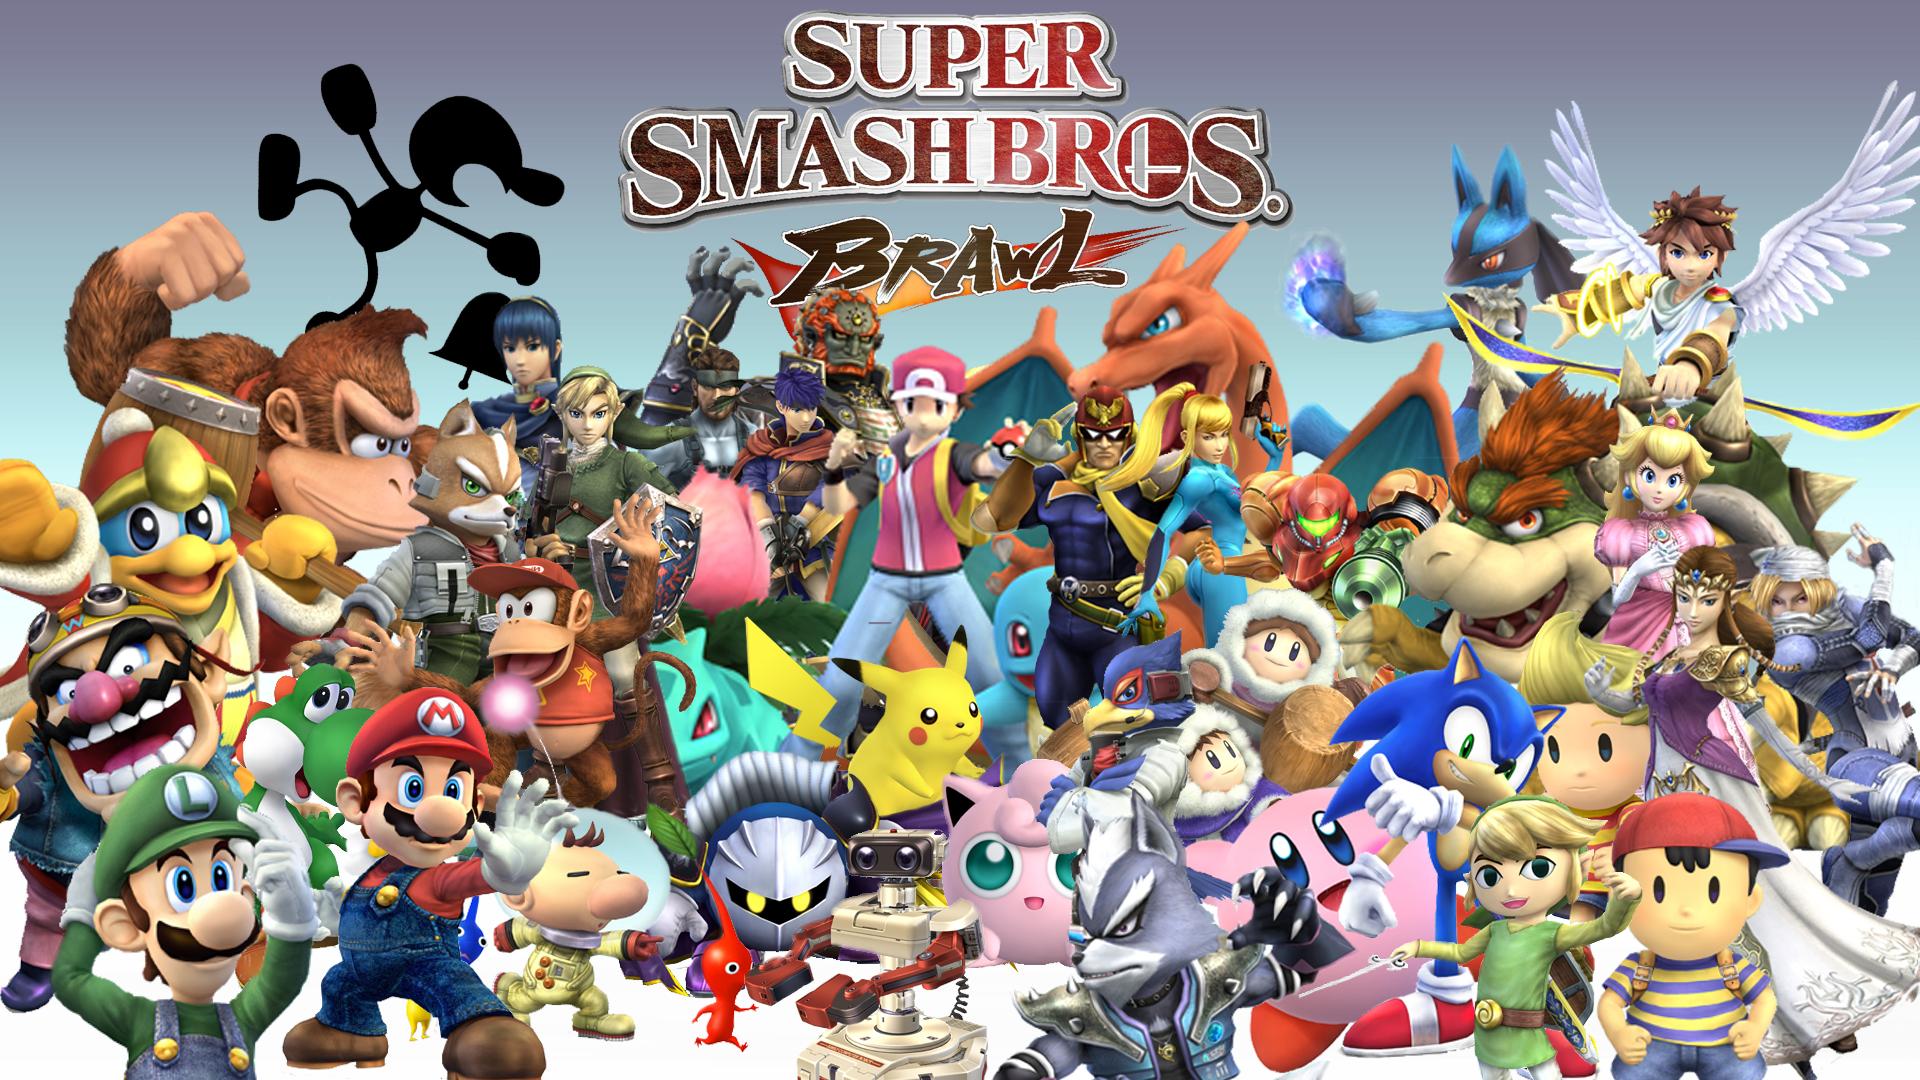 <b>Super Smash Bros Wallpaper</b>